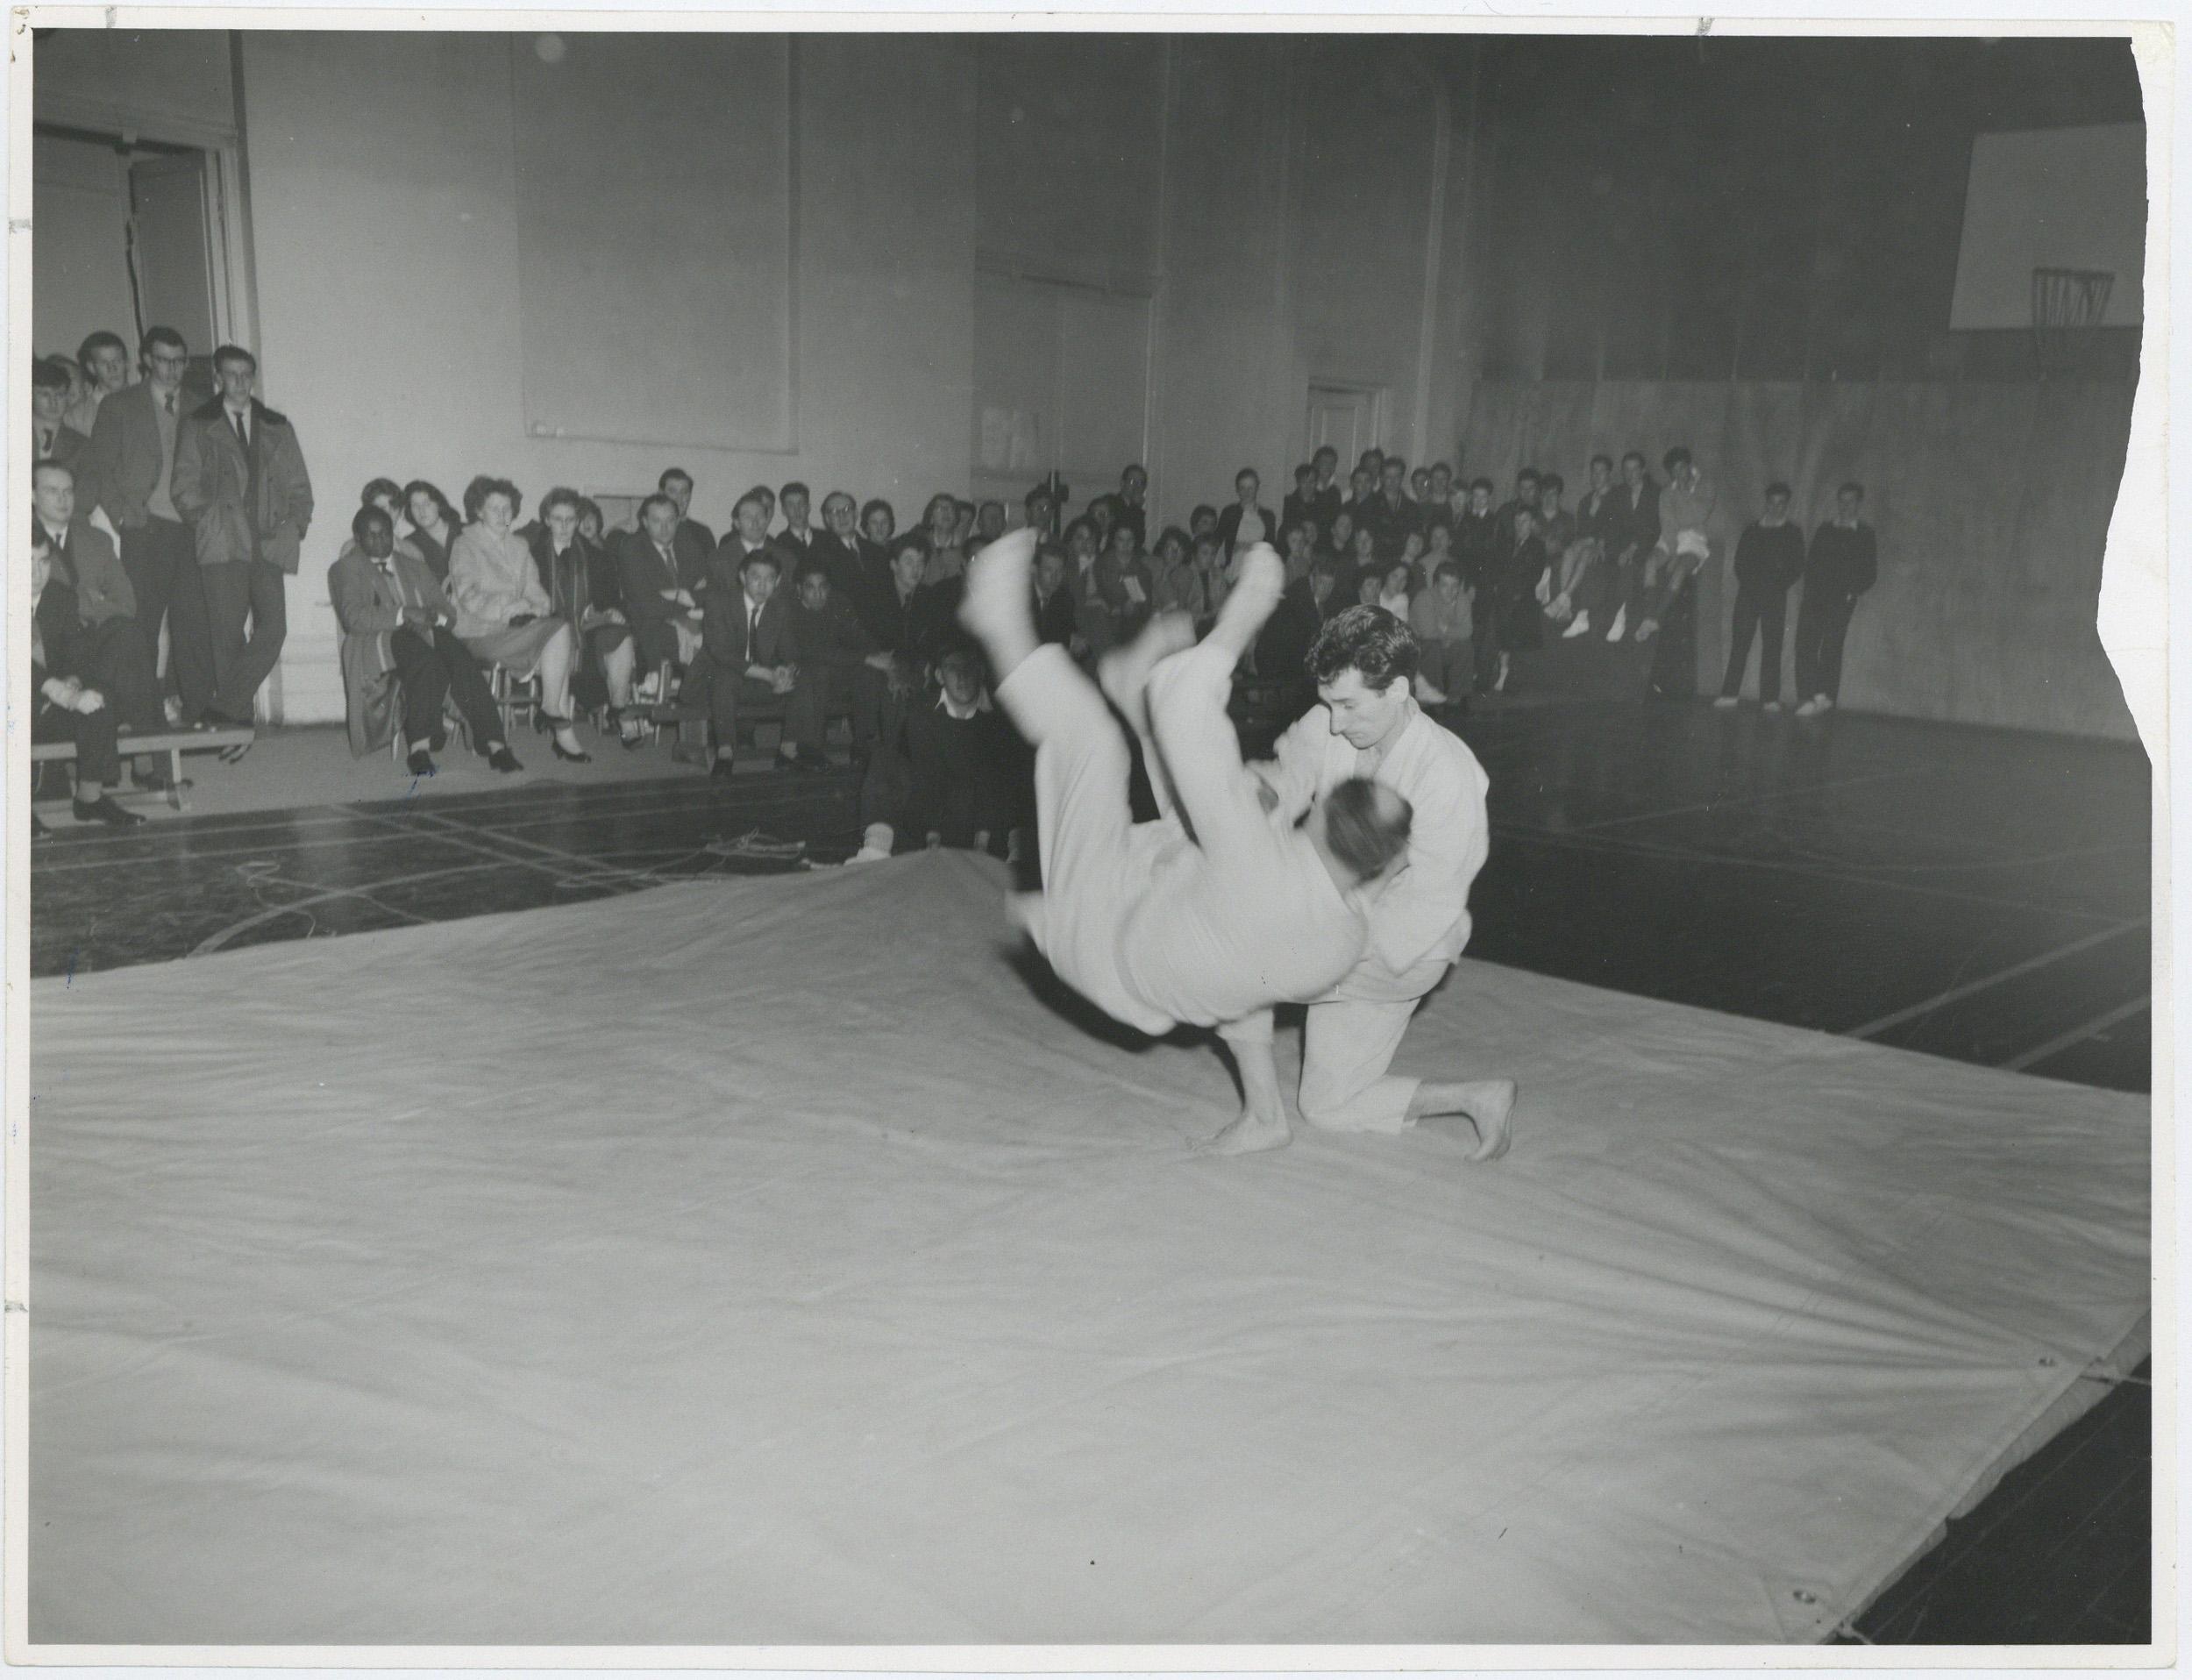 Judo match, 1963